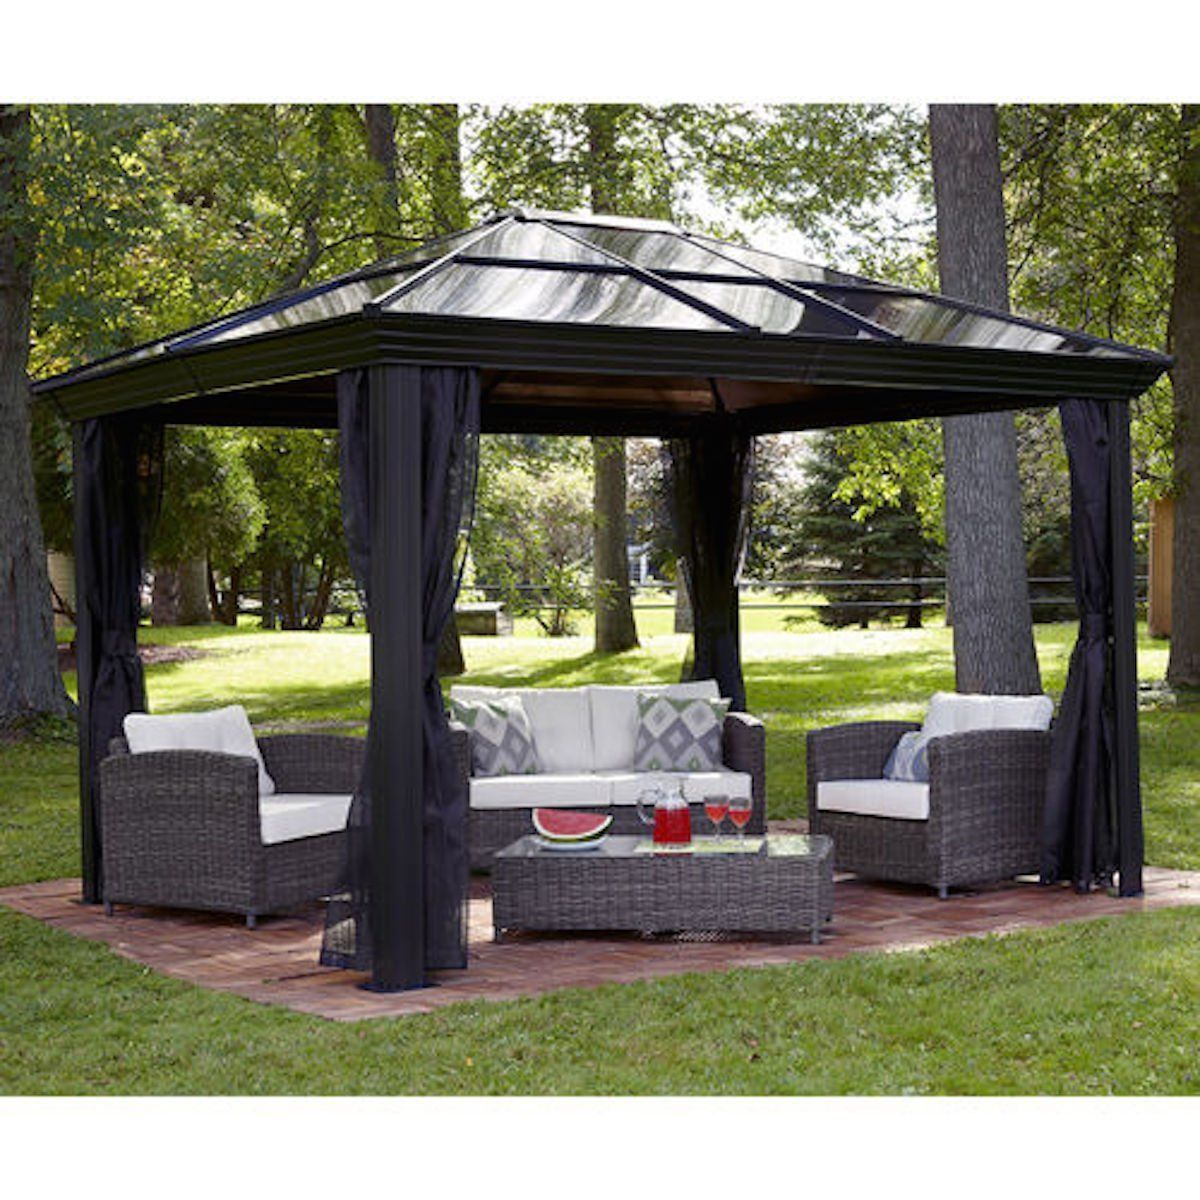 Badezimmer ideen 10x12 gazebo canopy pergola this  x  hardtop gazebo tent has a metal